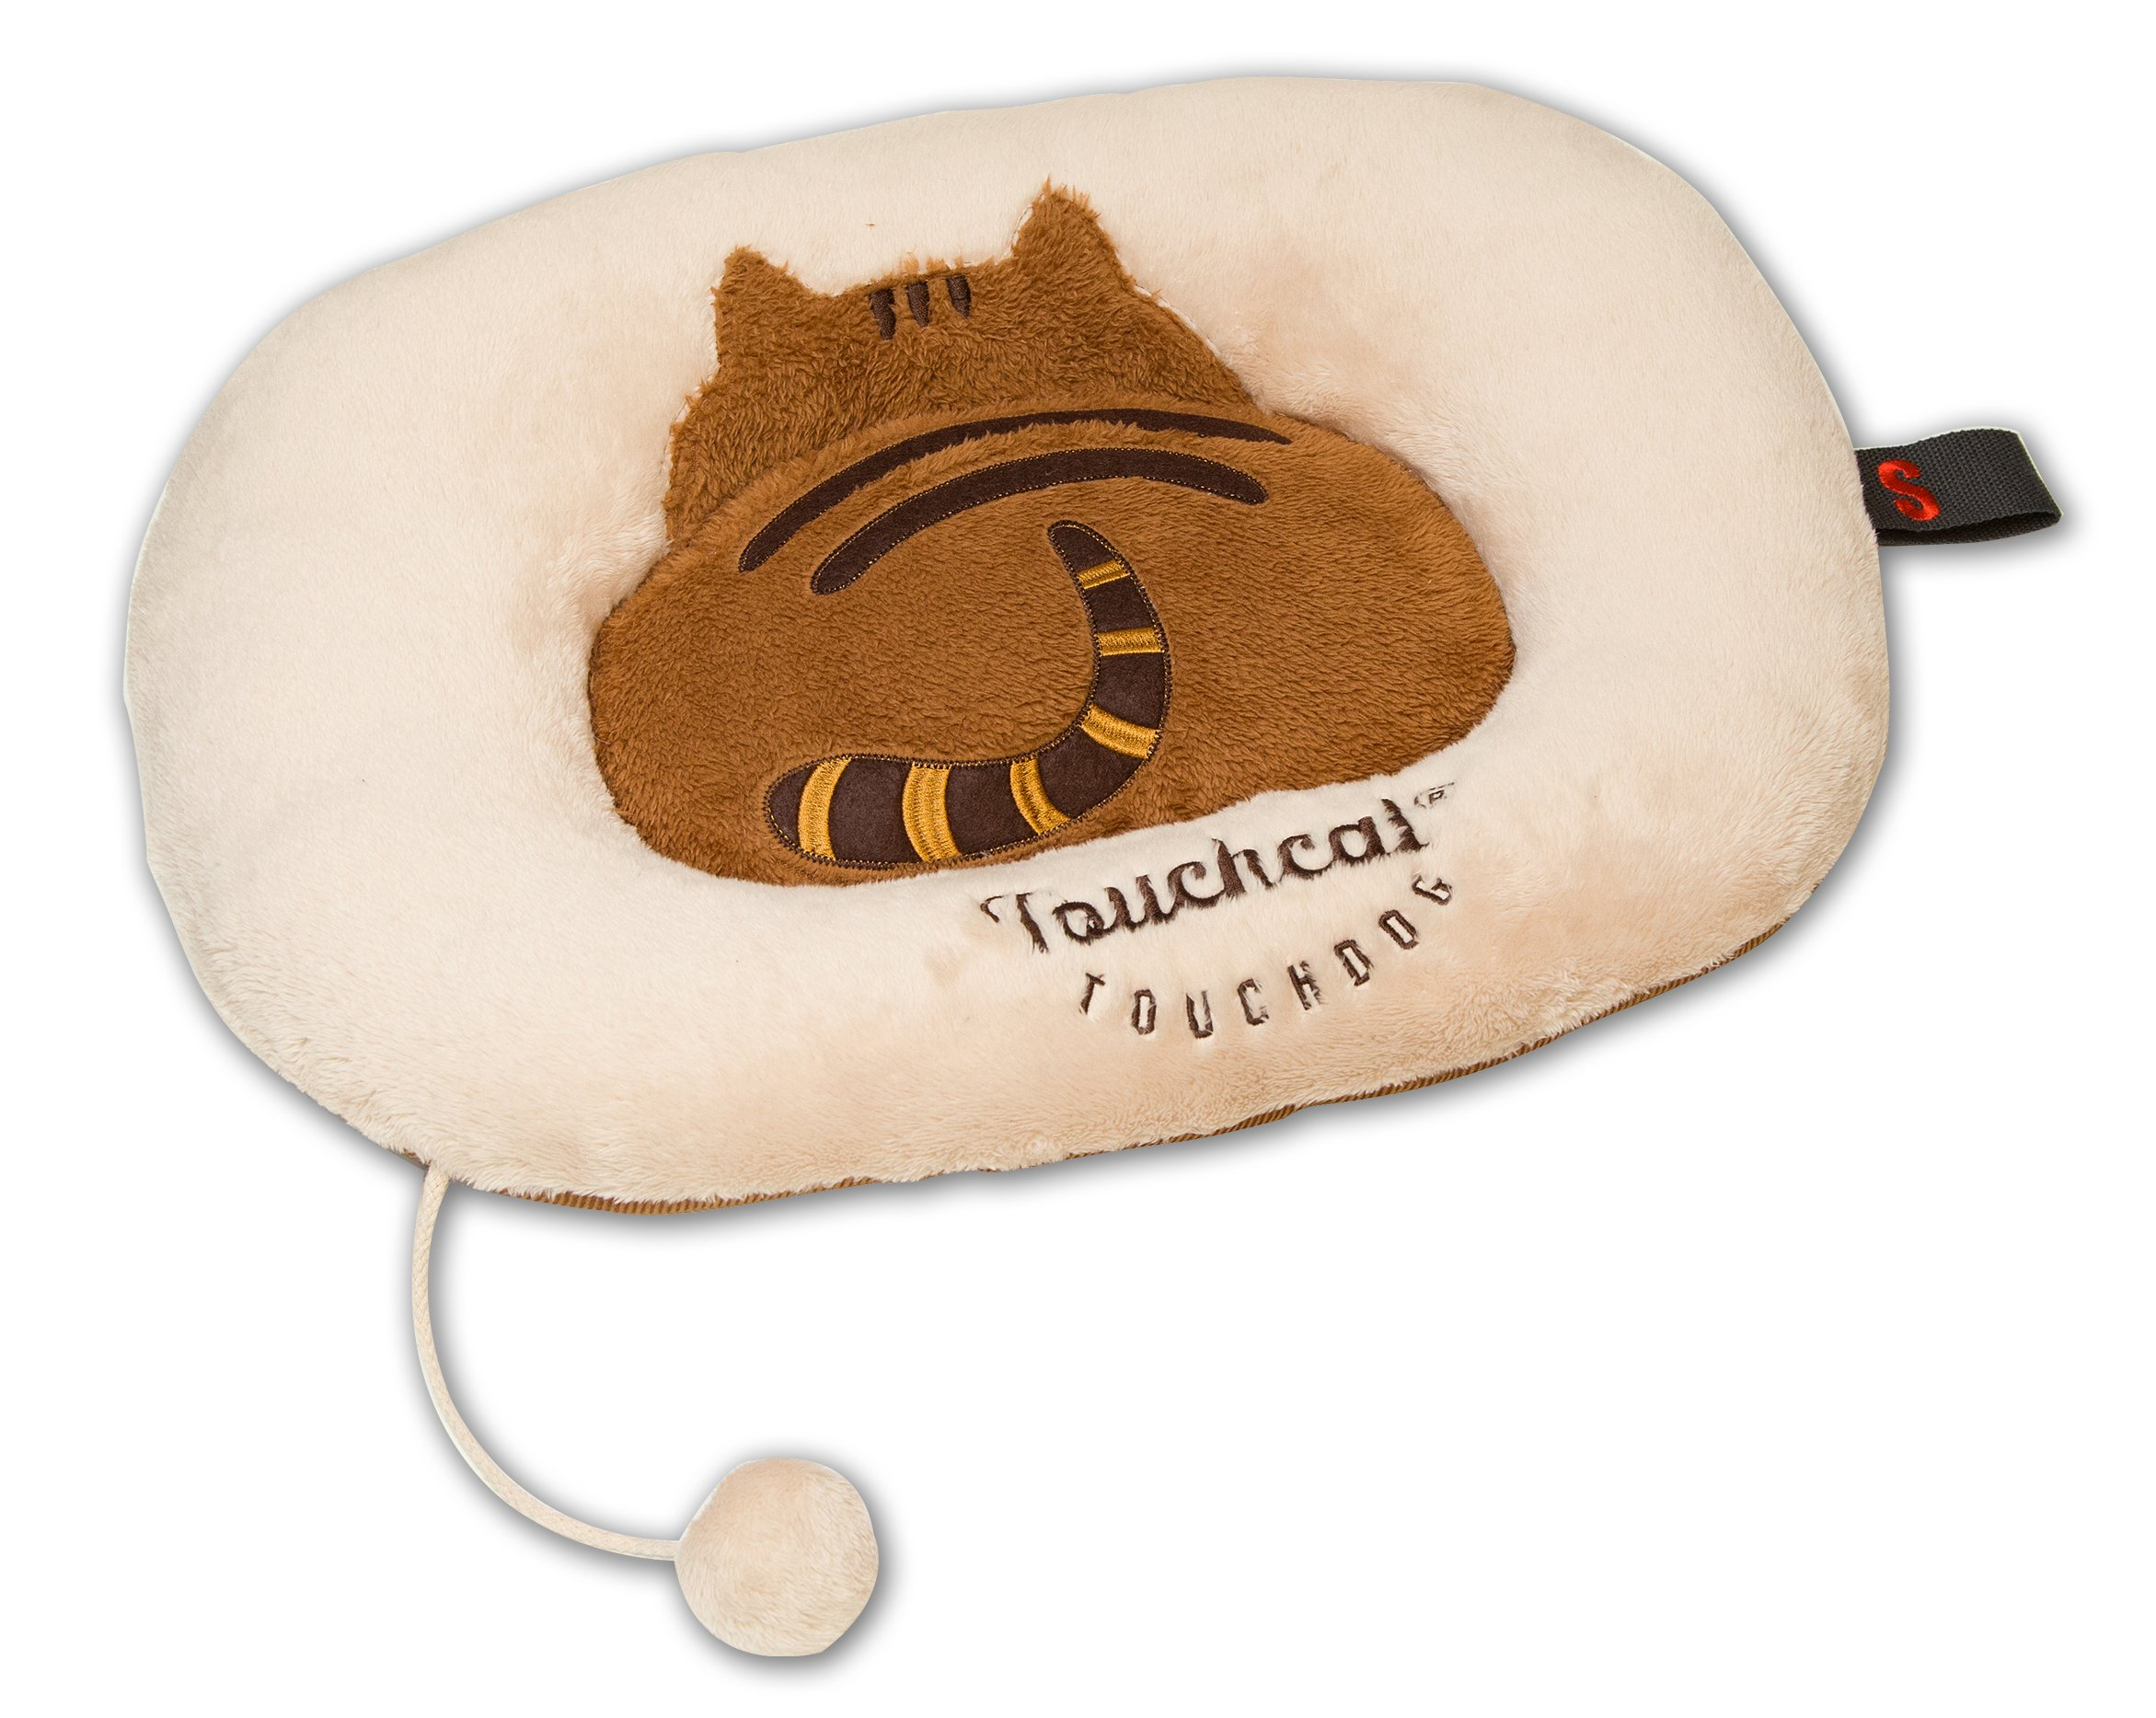 Touchcat 'Exquisite-Plush' Premium Kitty Fashion Designer Pet Cat Bed Lounger Mat Lounge, Small, Brown